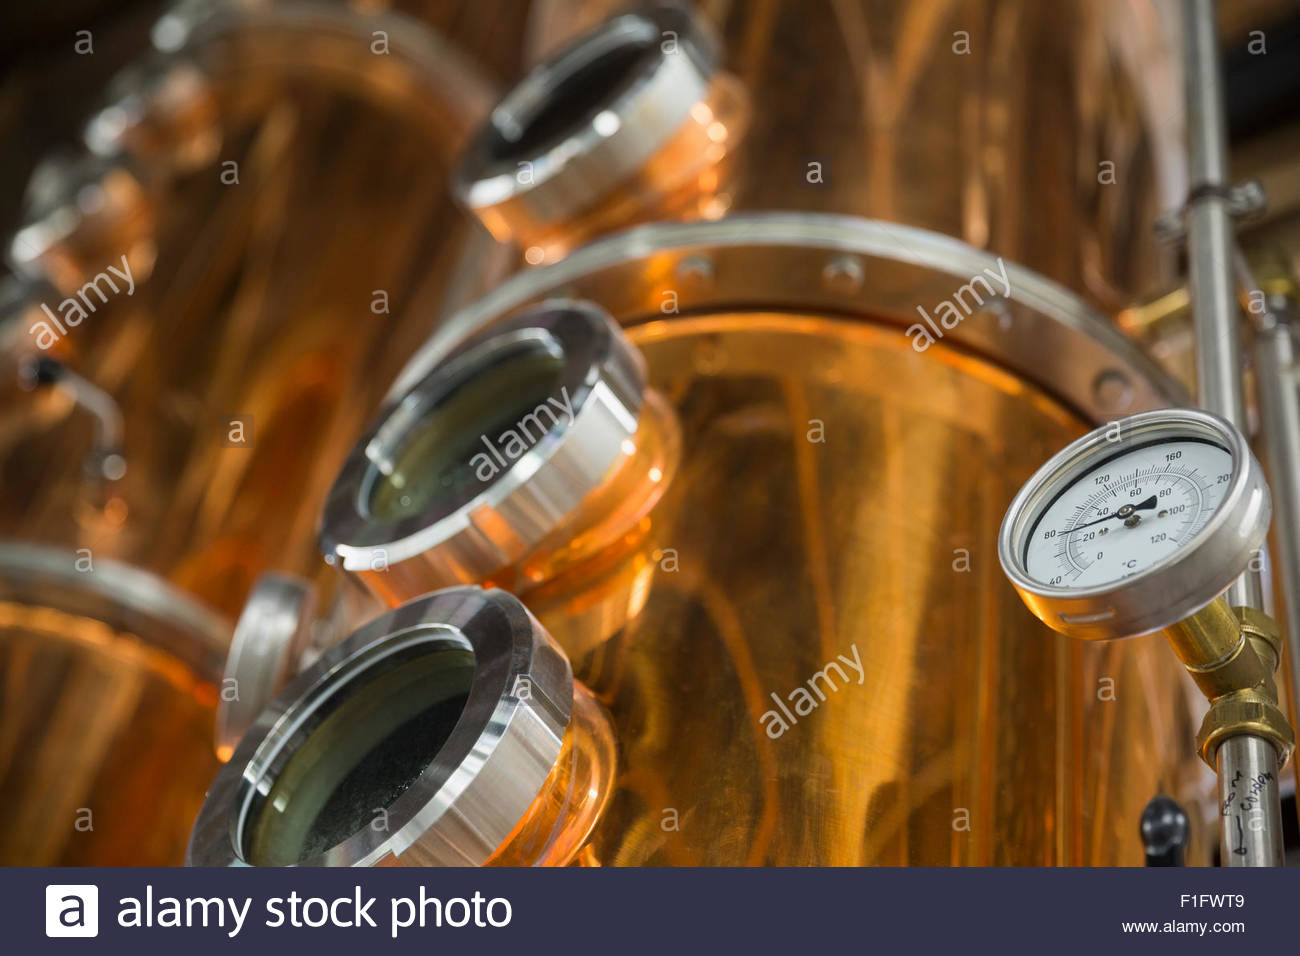 Gauge on copper distillery vat - Stock Image